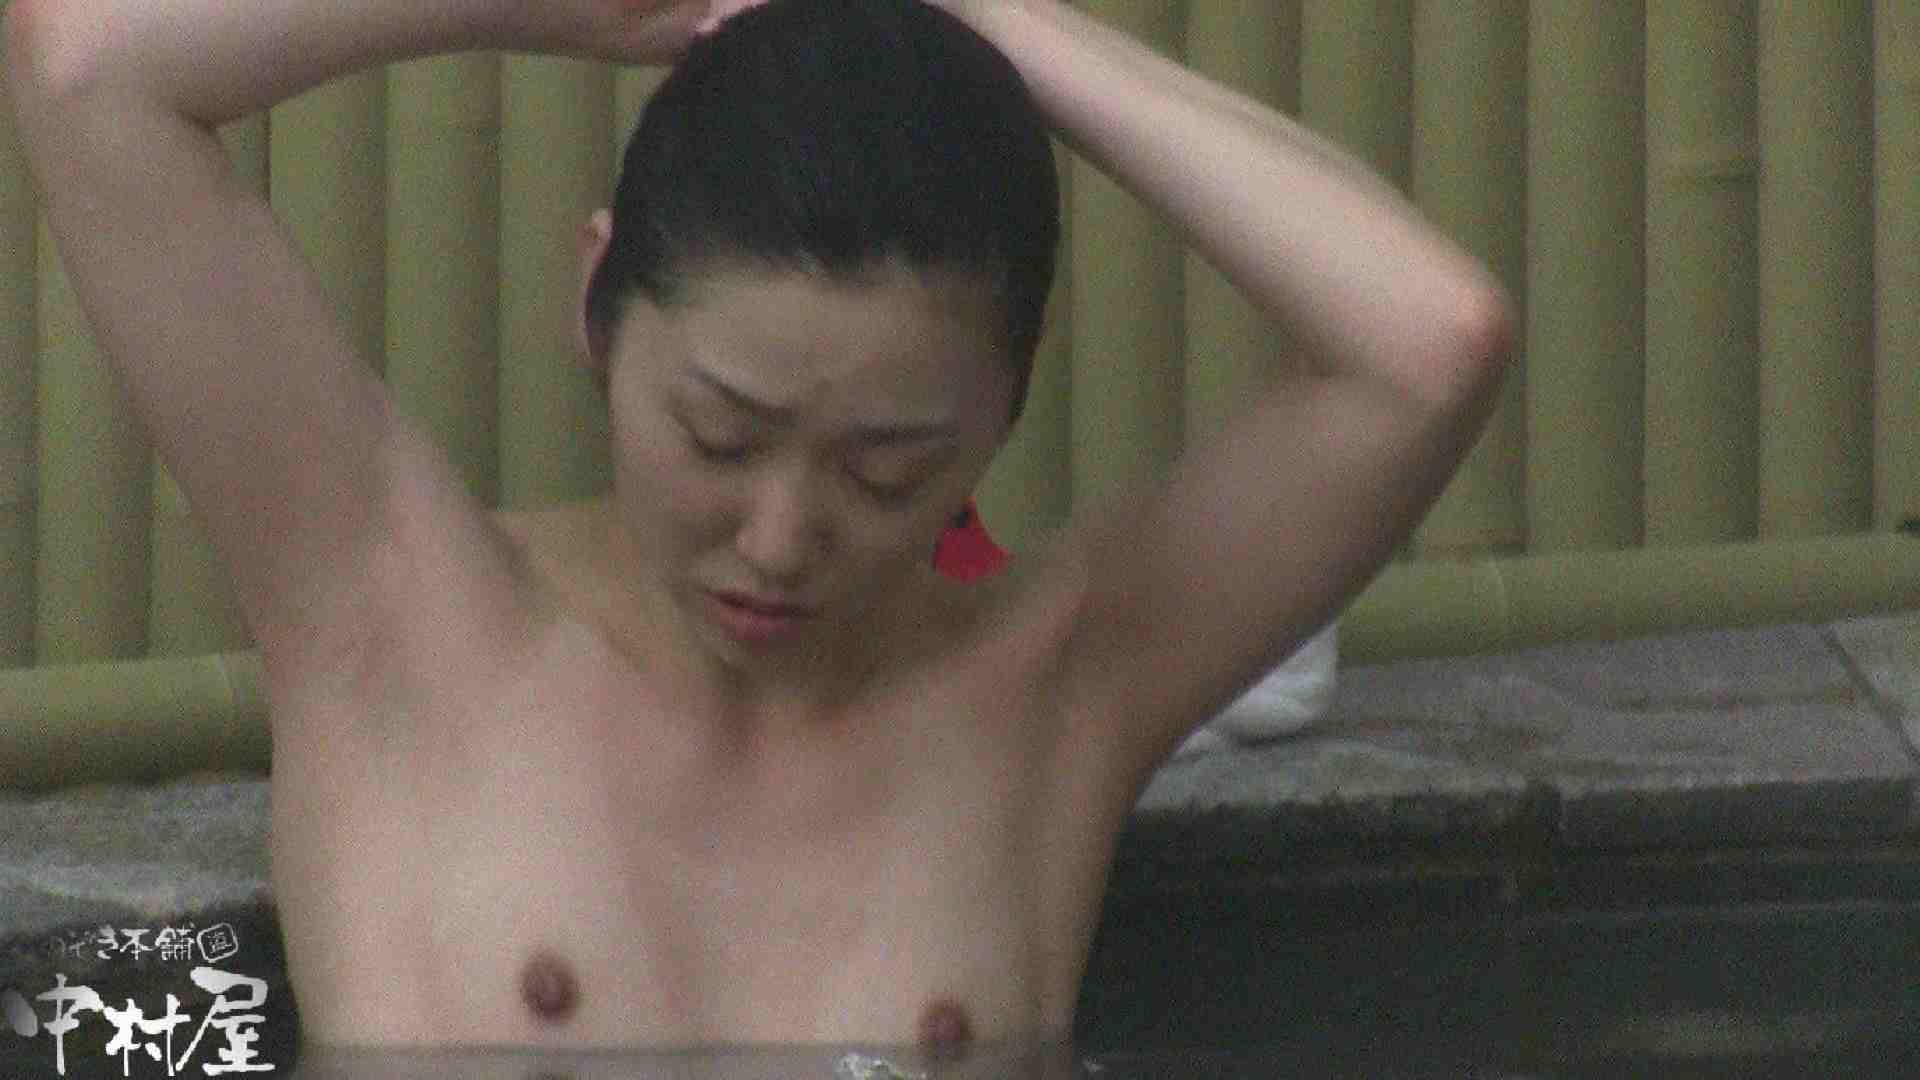 Aquaな露天風呂Vol.917 OLセックス  102画像 66